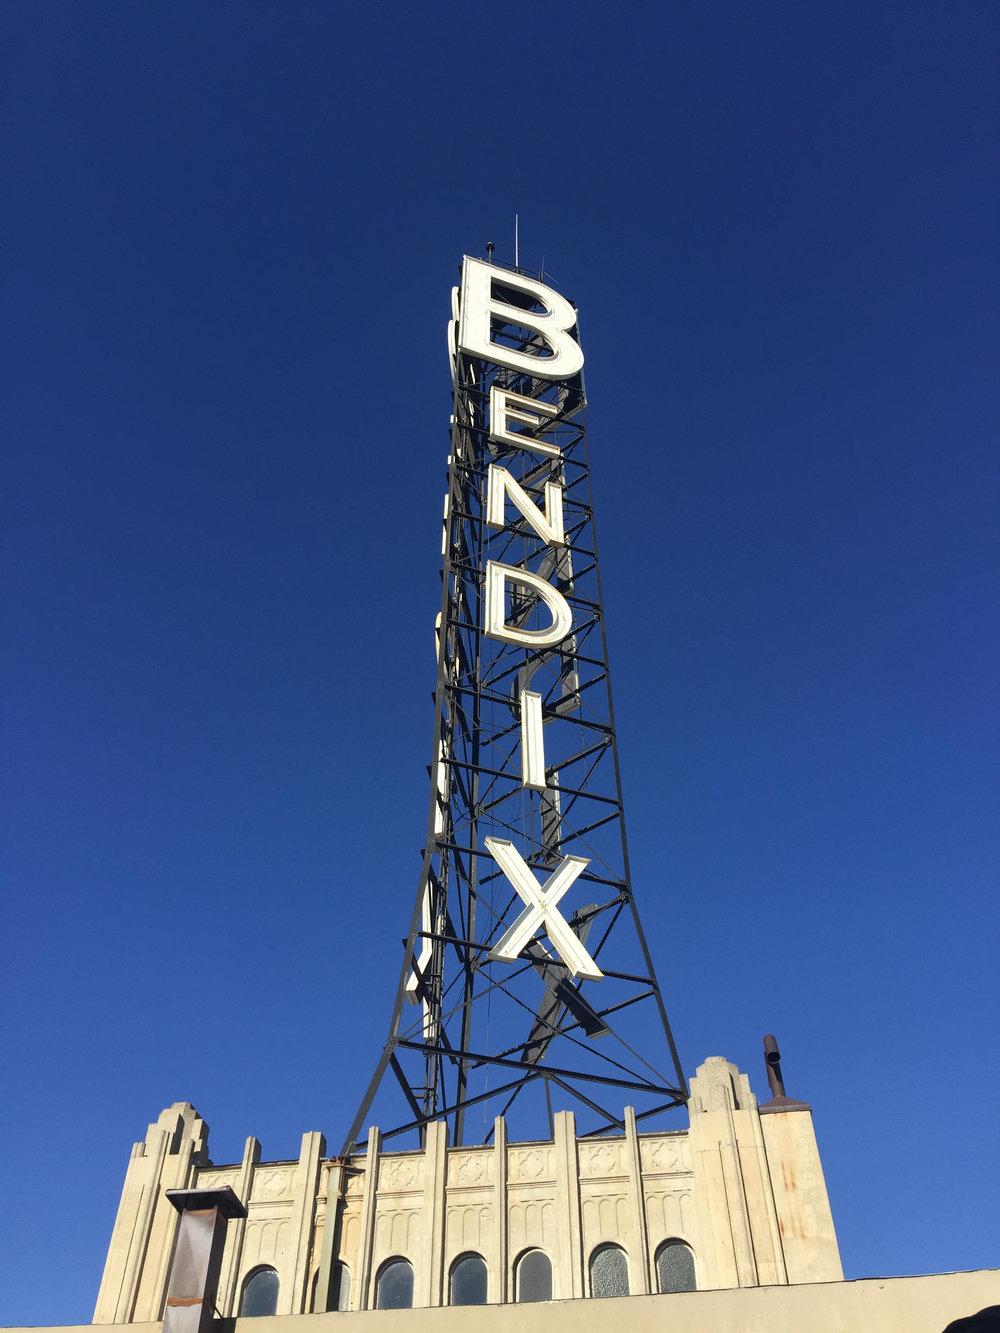 30% Off Concert Series - At the Historic Bendix Building in DTLA